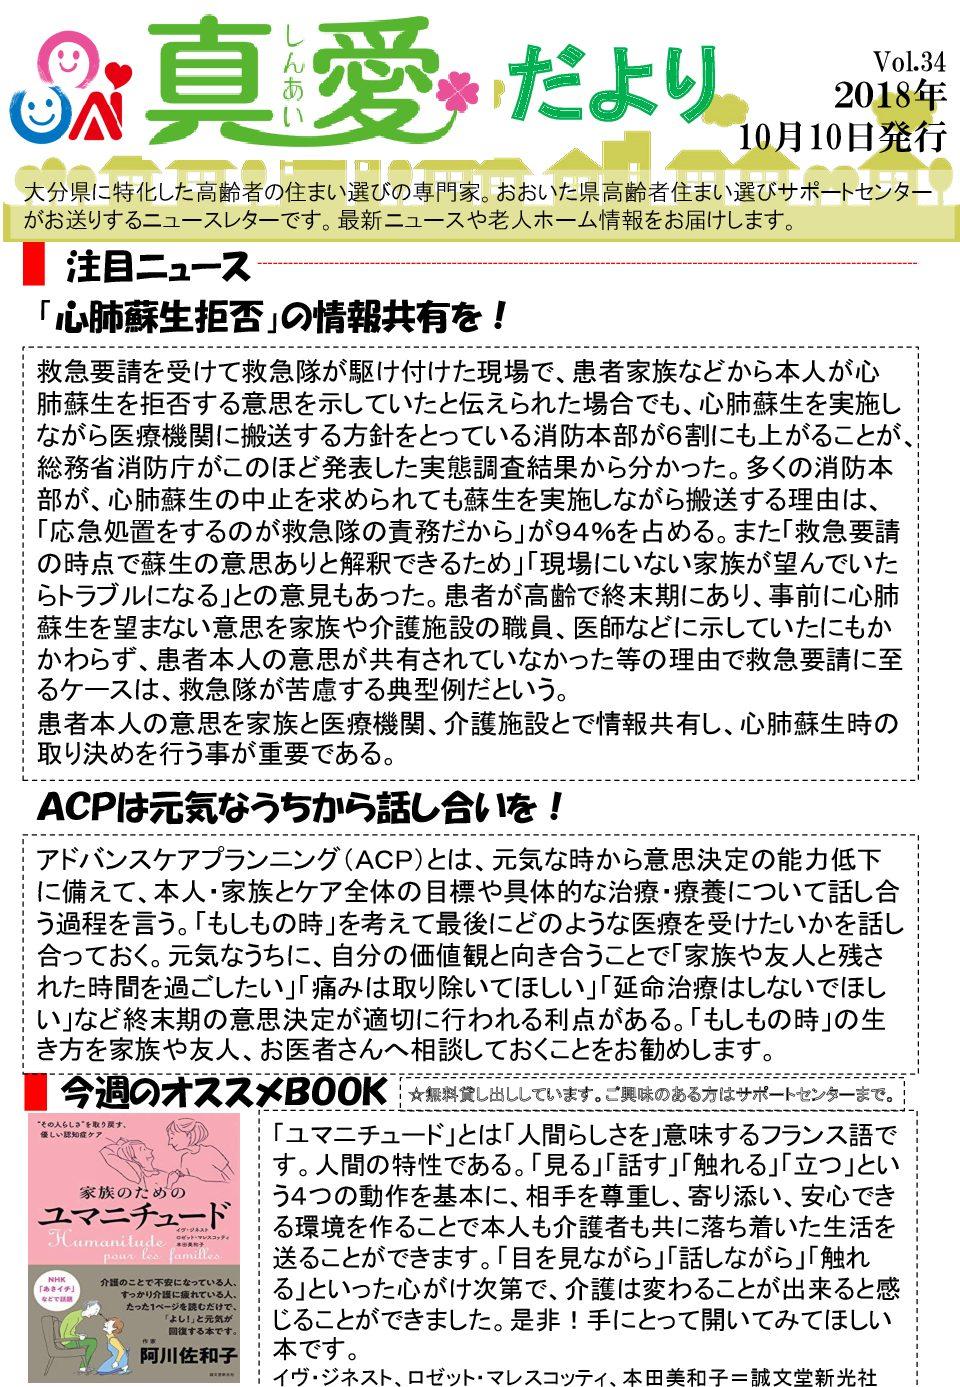 【Vol.34】 2018.10.10発行